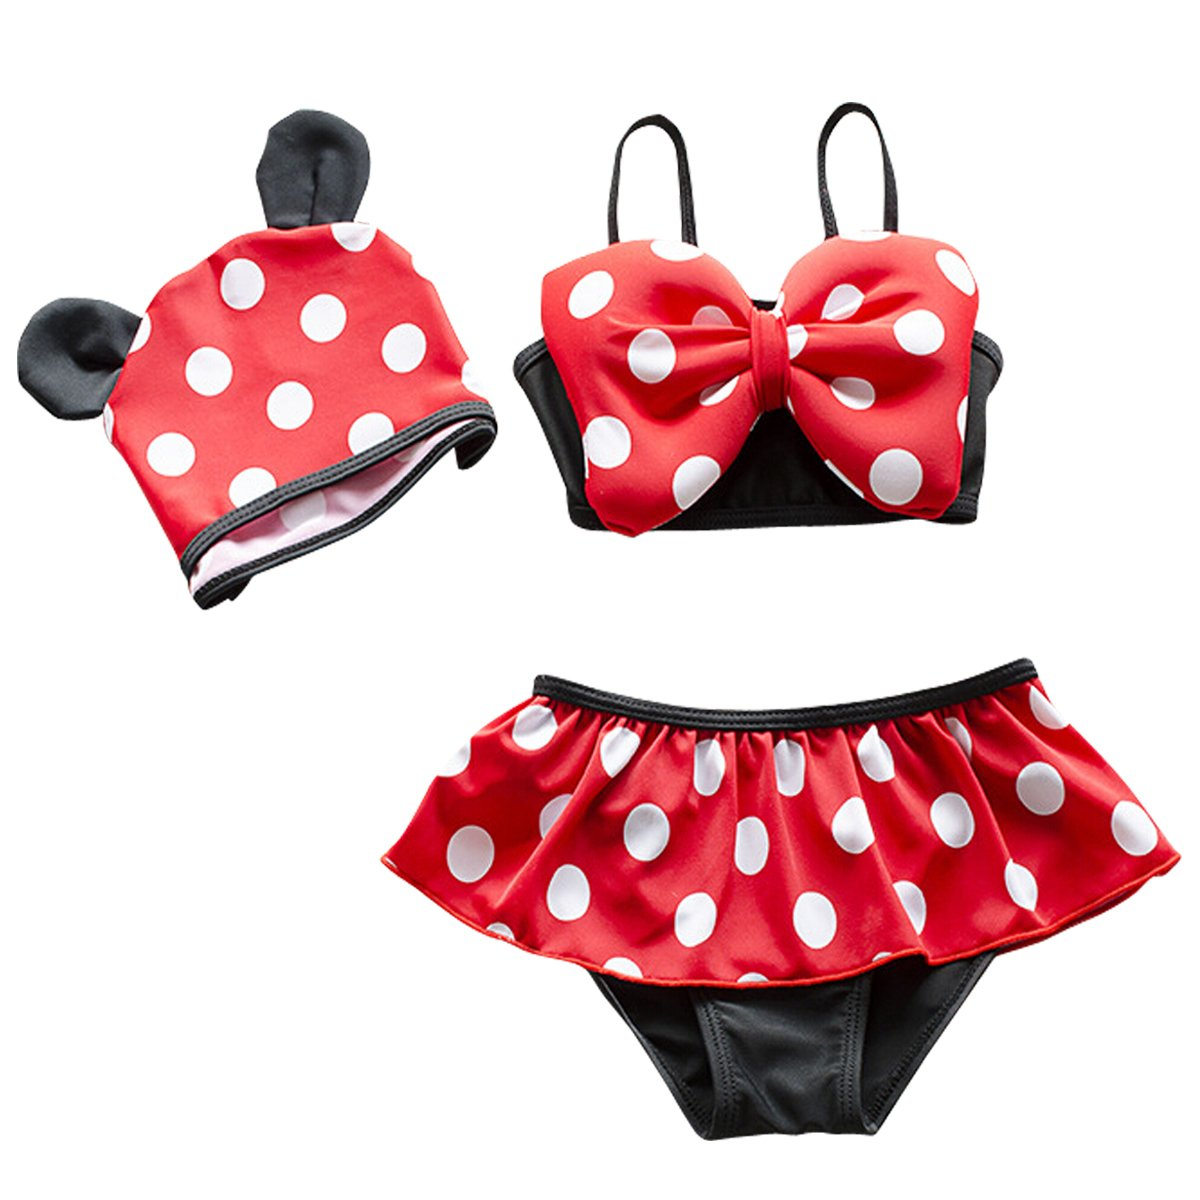 Jastore® 3pcs Baby Girls Swimwear Cute Polka Dots Bikini Set Swimsuit (XL/5-6T) 2448445035